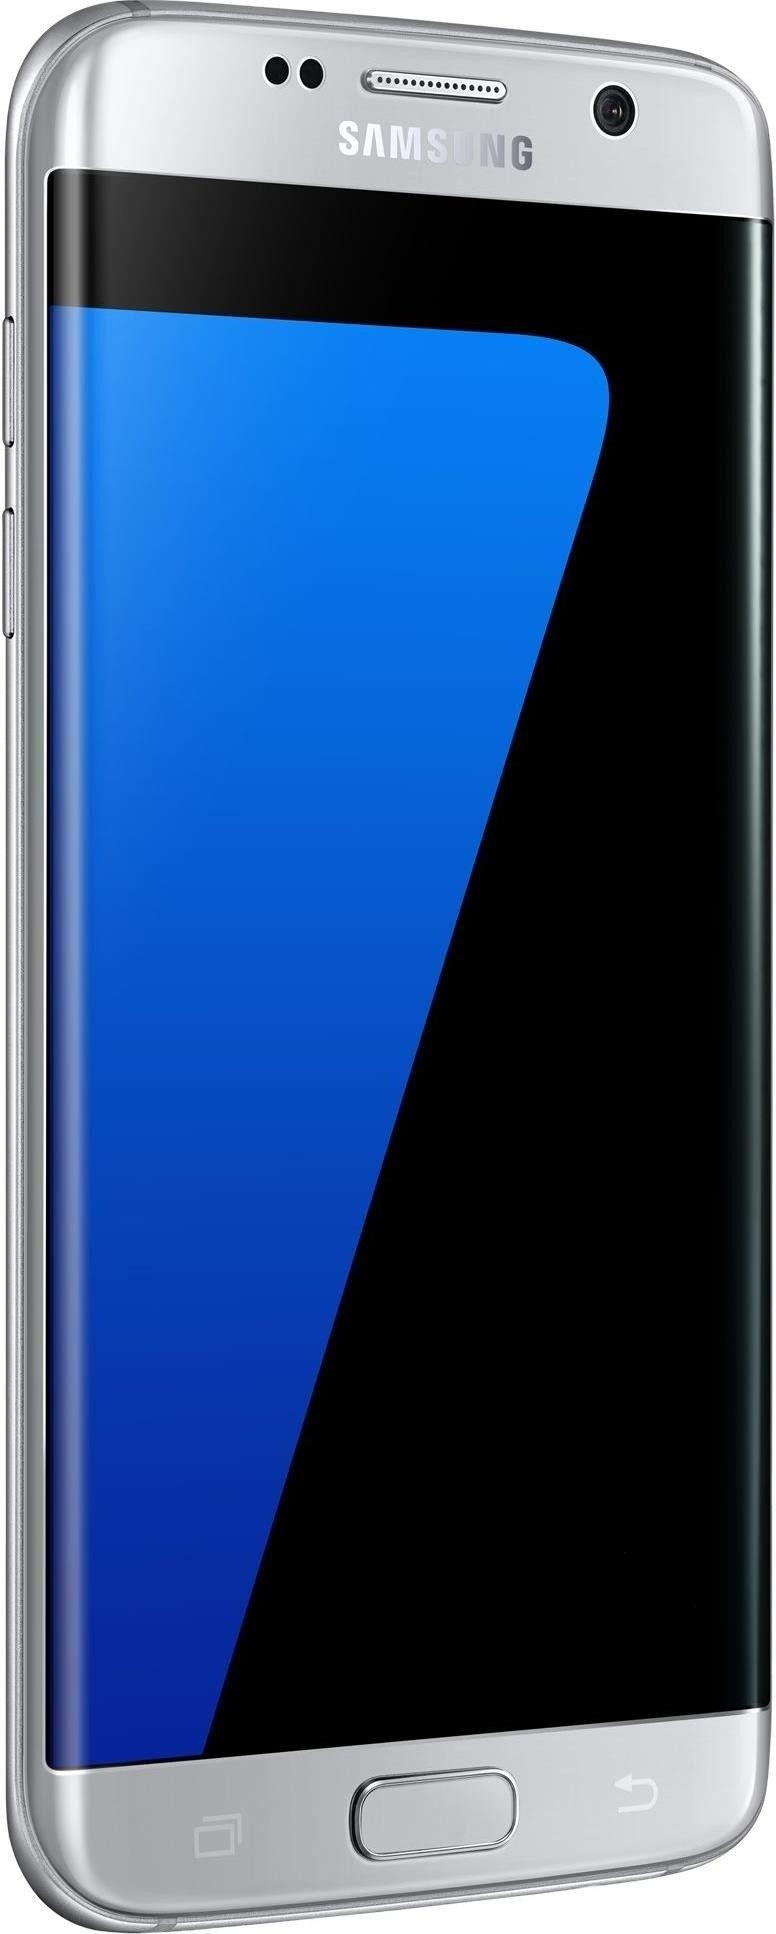 Мобильный телефон Samsung Galaxy S7 Edge Duos G935 (SM-G935FZSUSEK) Silver - 3